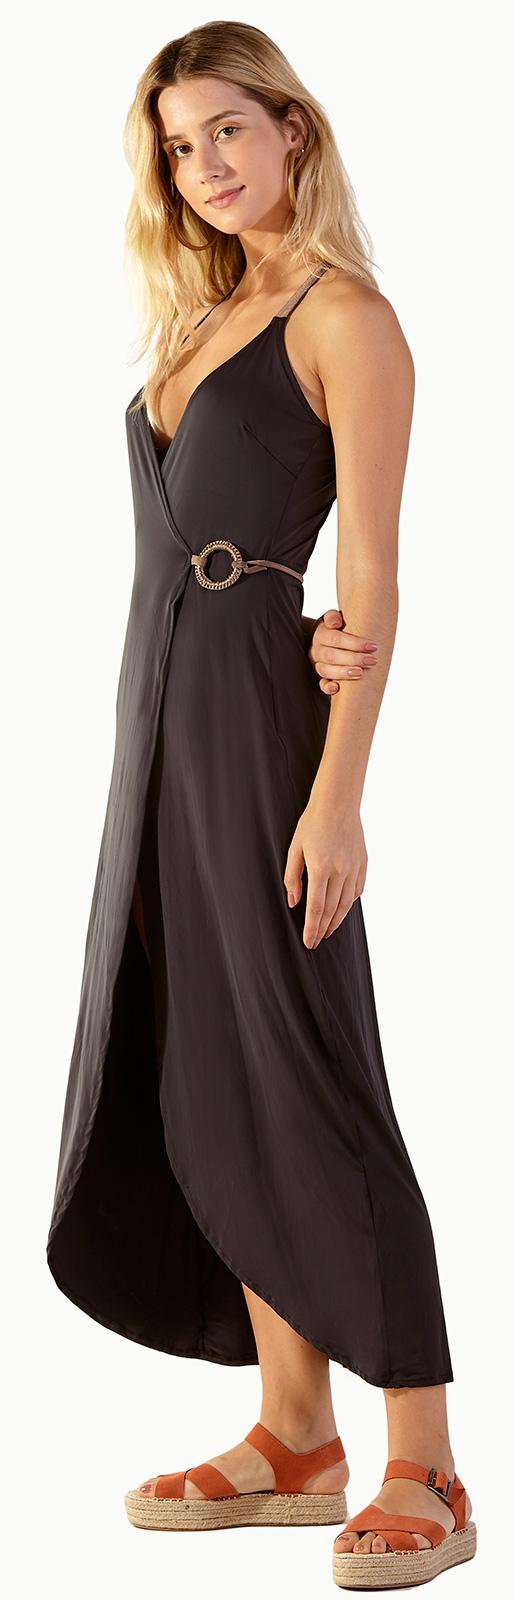 Schwarzes Langes Kleid Mit Herz-dekolletee - Monique Pier ...